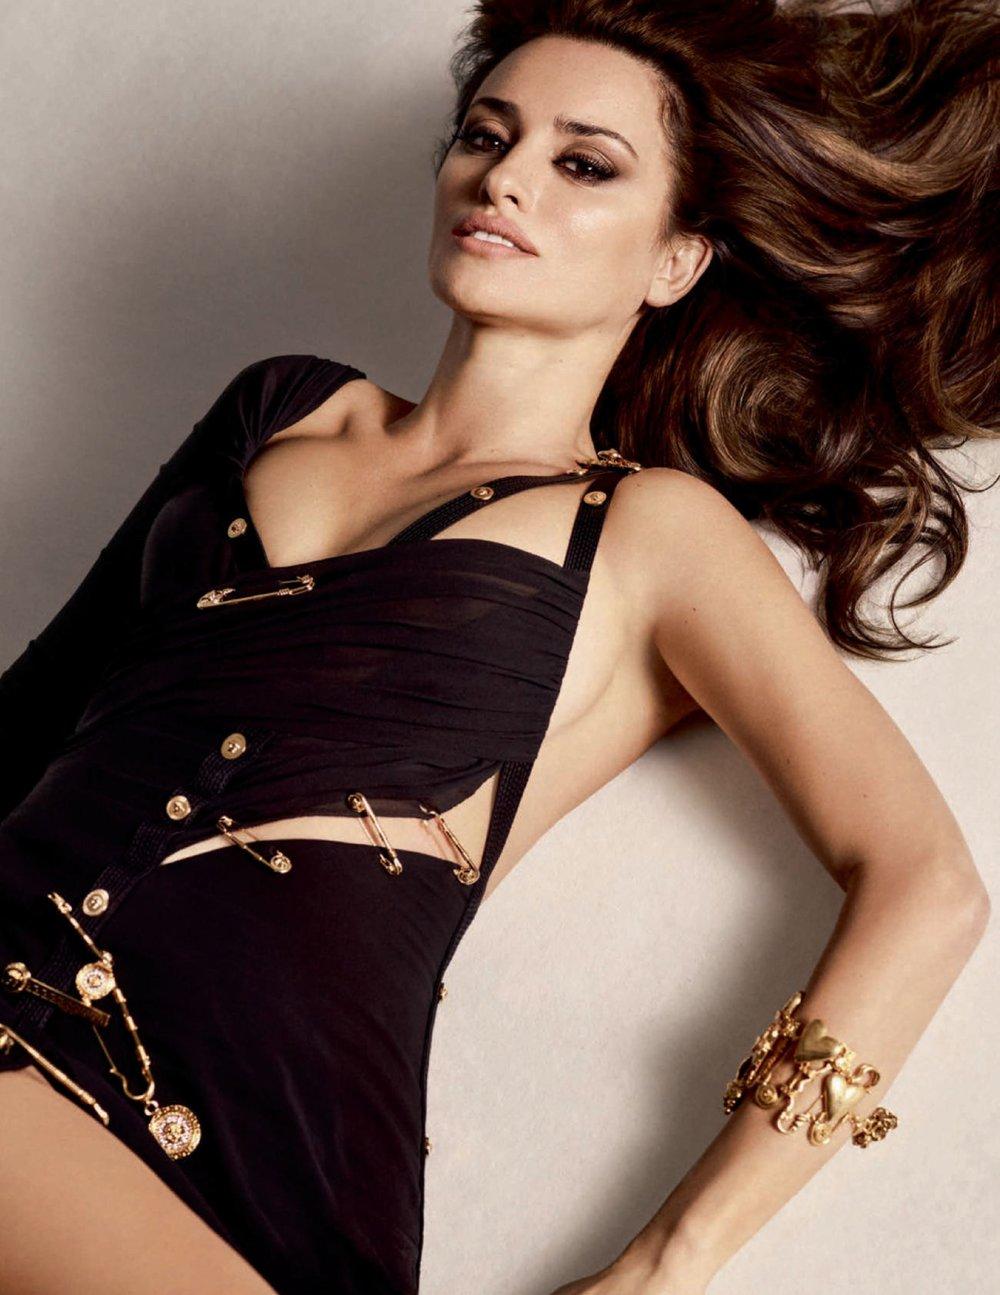 Penelope-Cruz-Luigi-Iango-Vogue-Spain-April-2019- (11).jpg